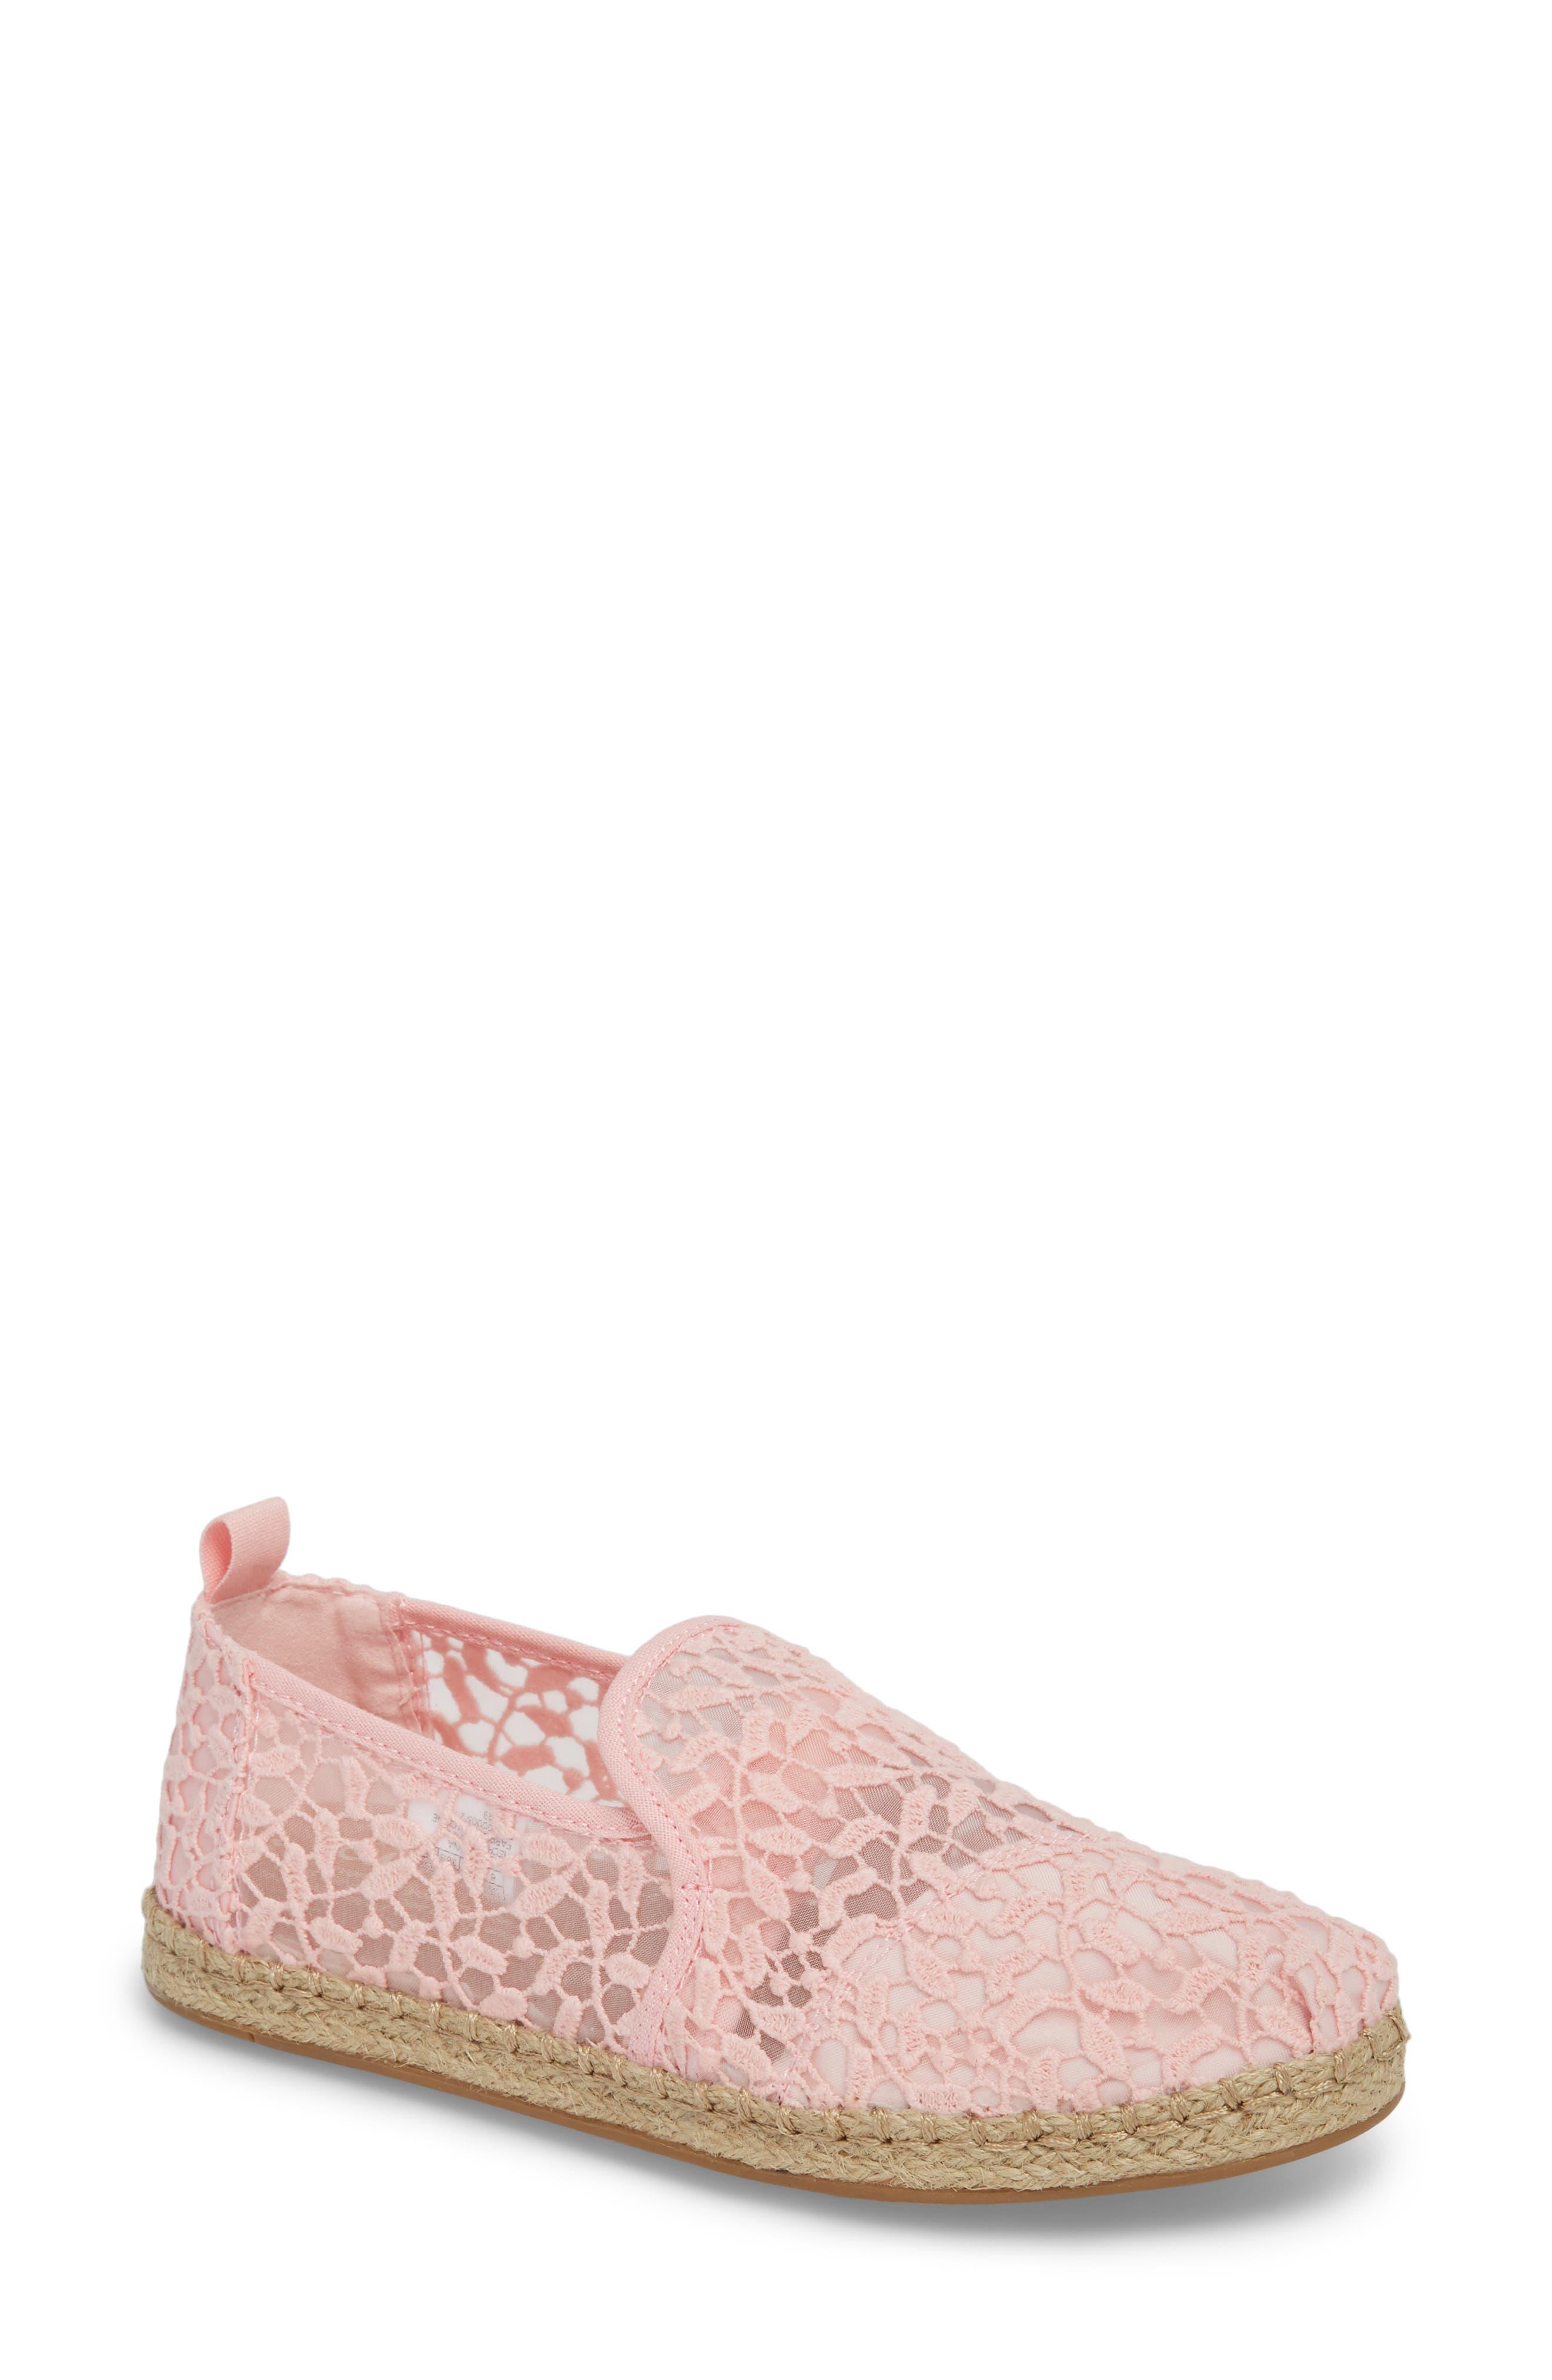 Deconstructed Alpargata Espadrille Slip-On,                             Main thumbnail 1, color,                             Blossom Lace Leaves